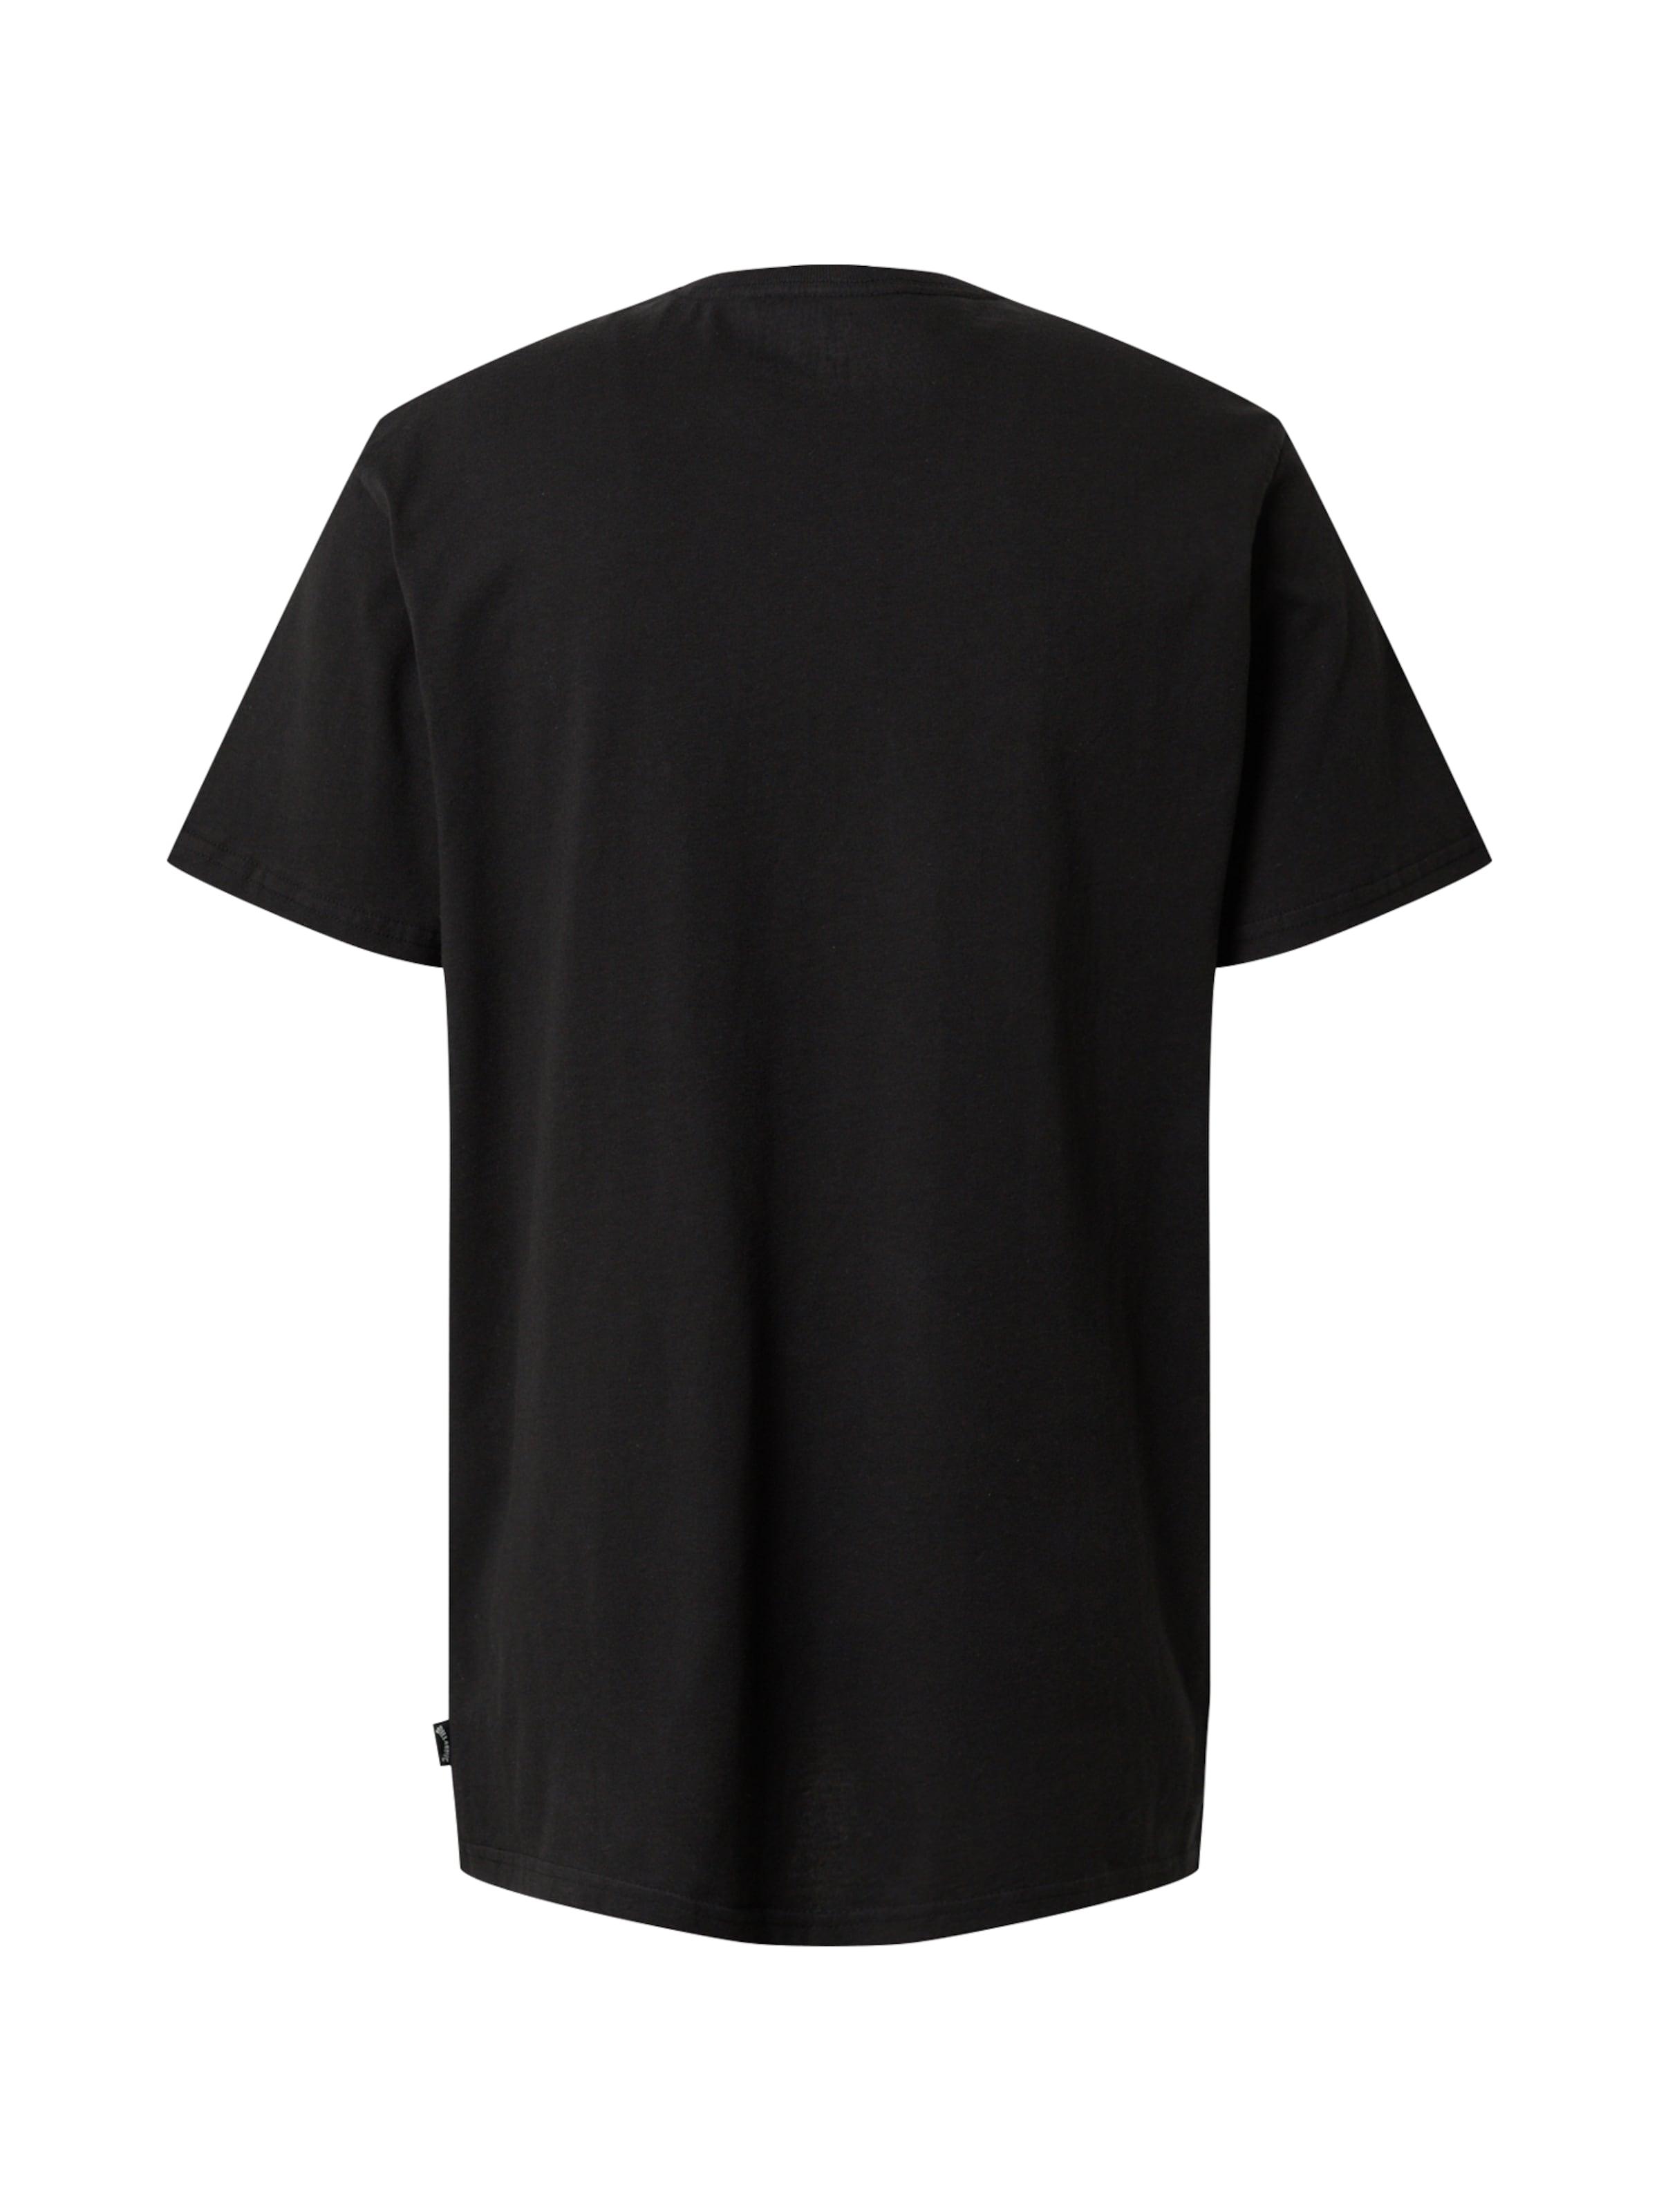 BILLABONG Shirt 'Trademark' in schwarz / weiß Logoprint BIL0868002000001